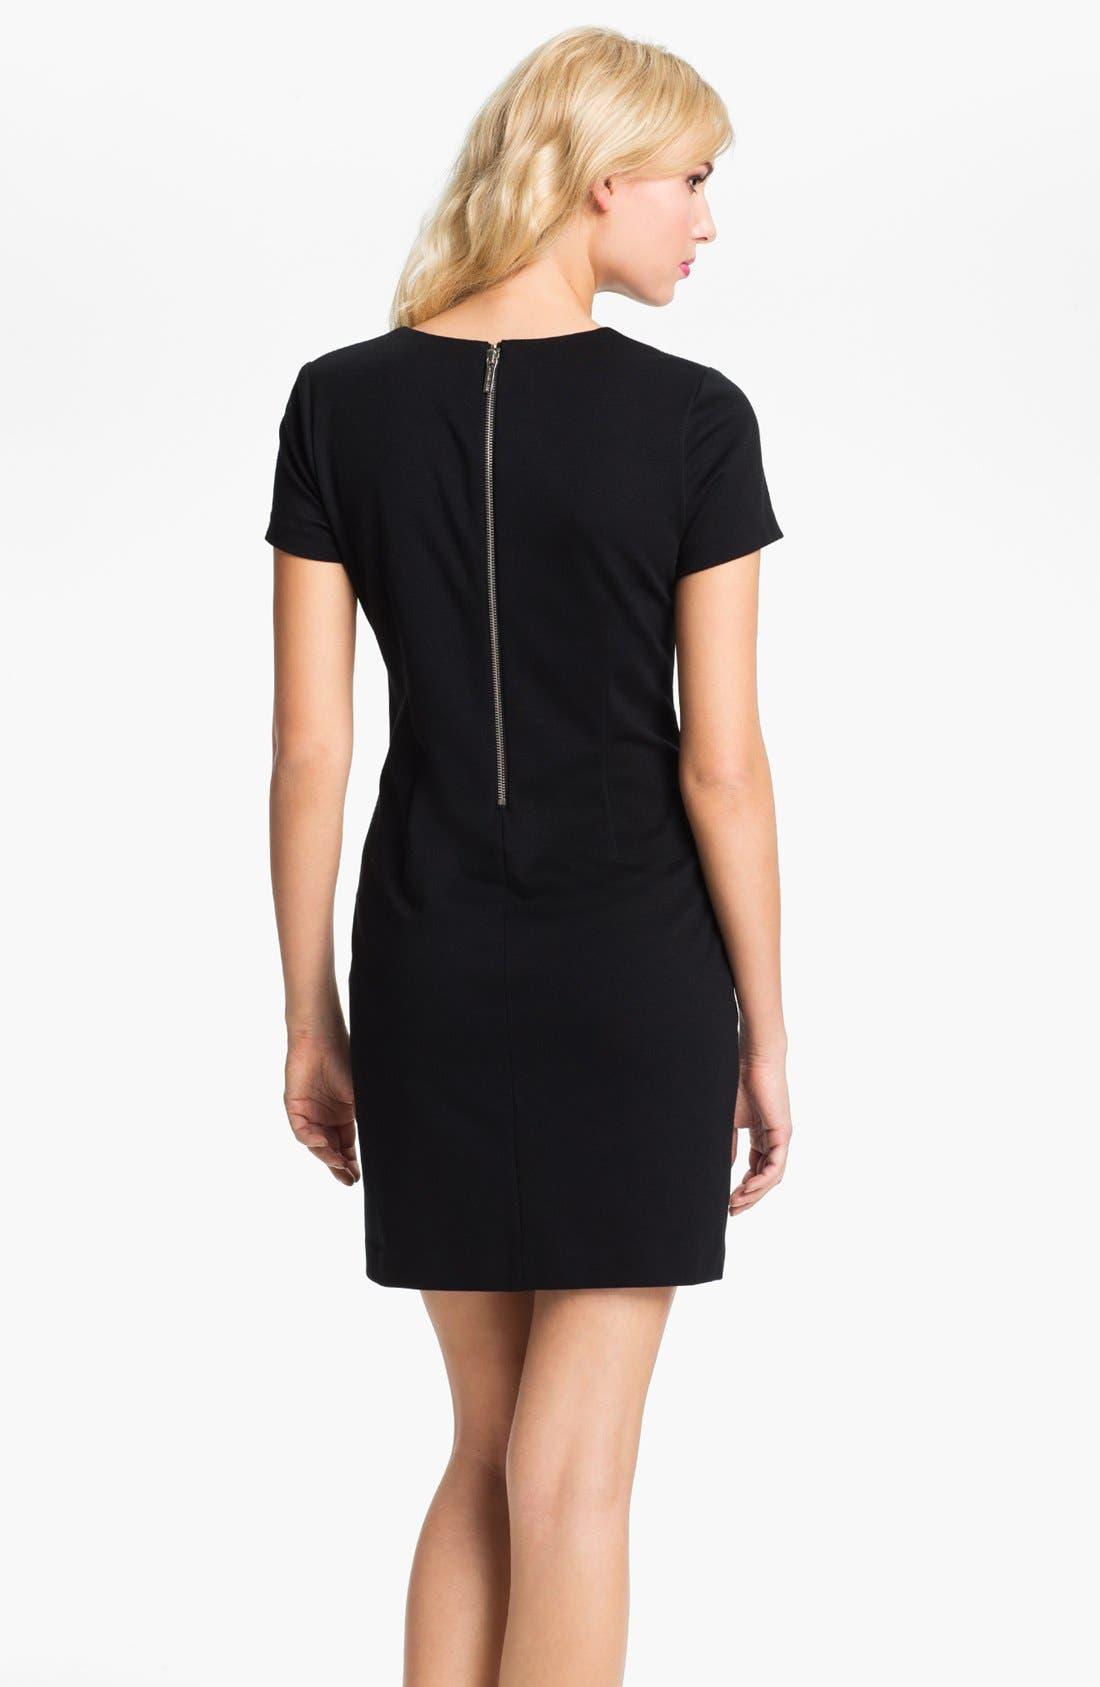 Alternate Image 2  - MICHAEL Michael Kors Studded Short Sleeve Dress (Petite)